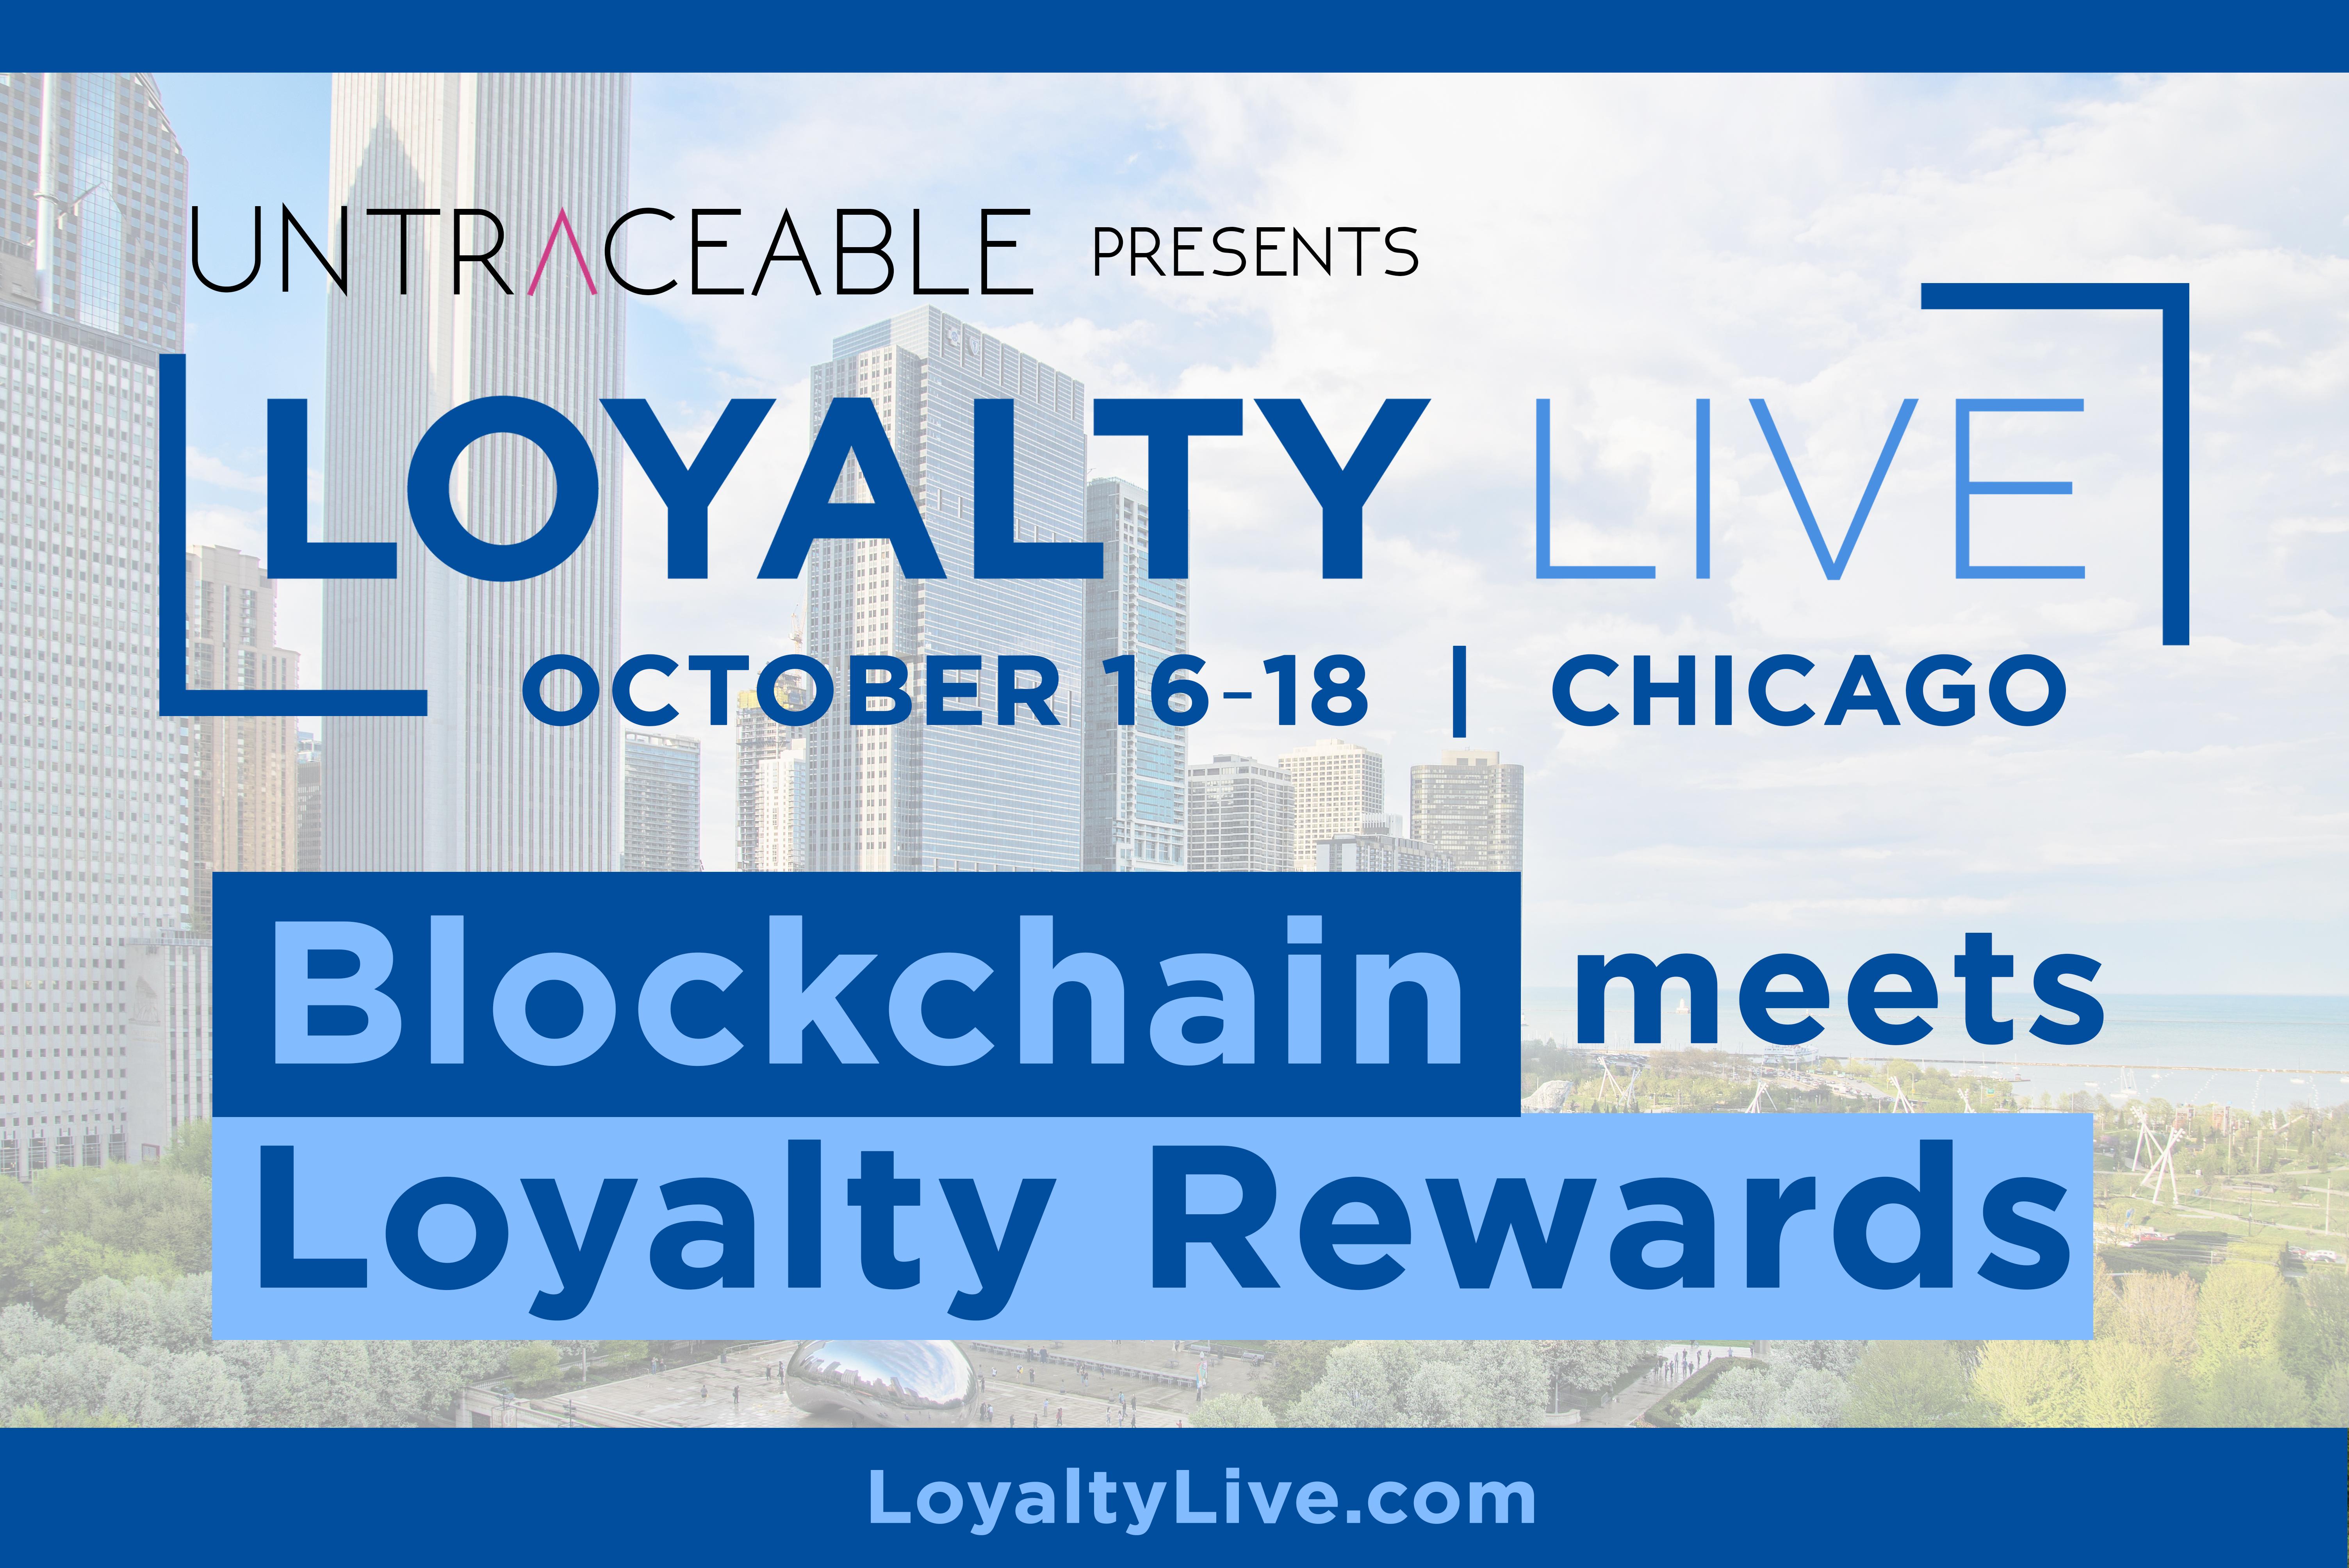 Loyalty Live Image